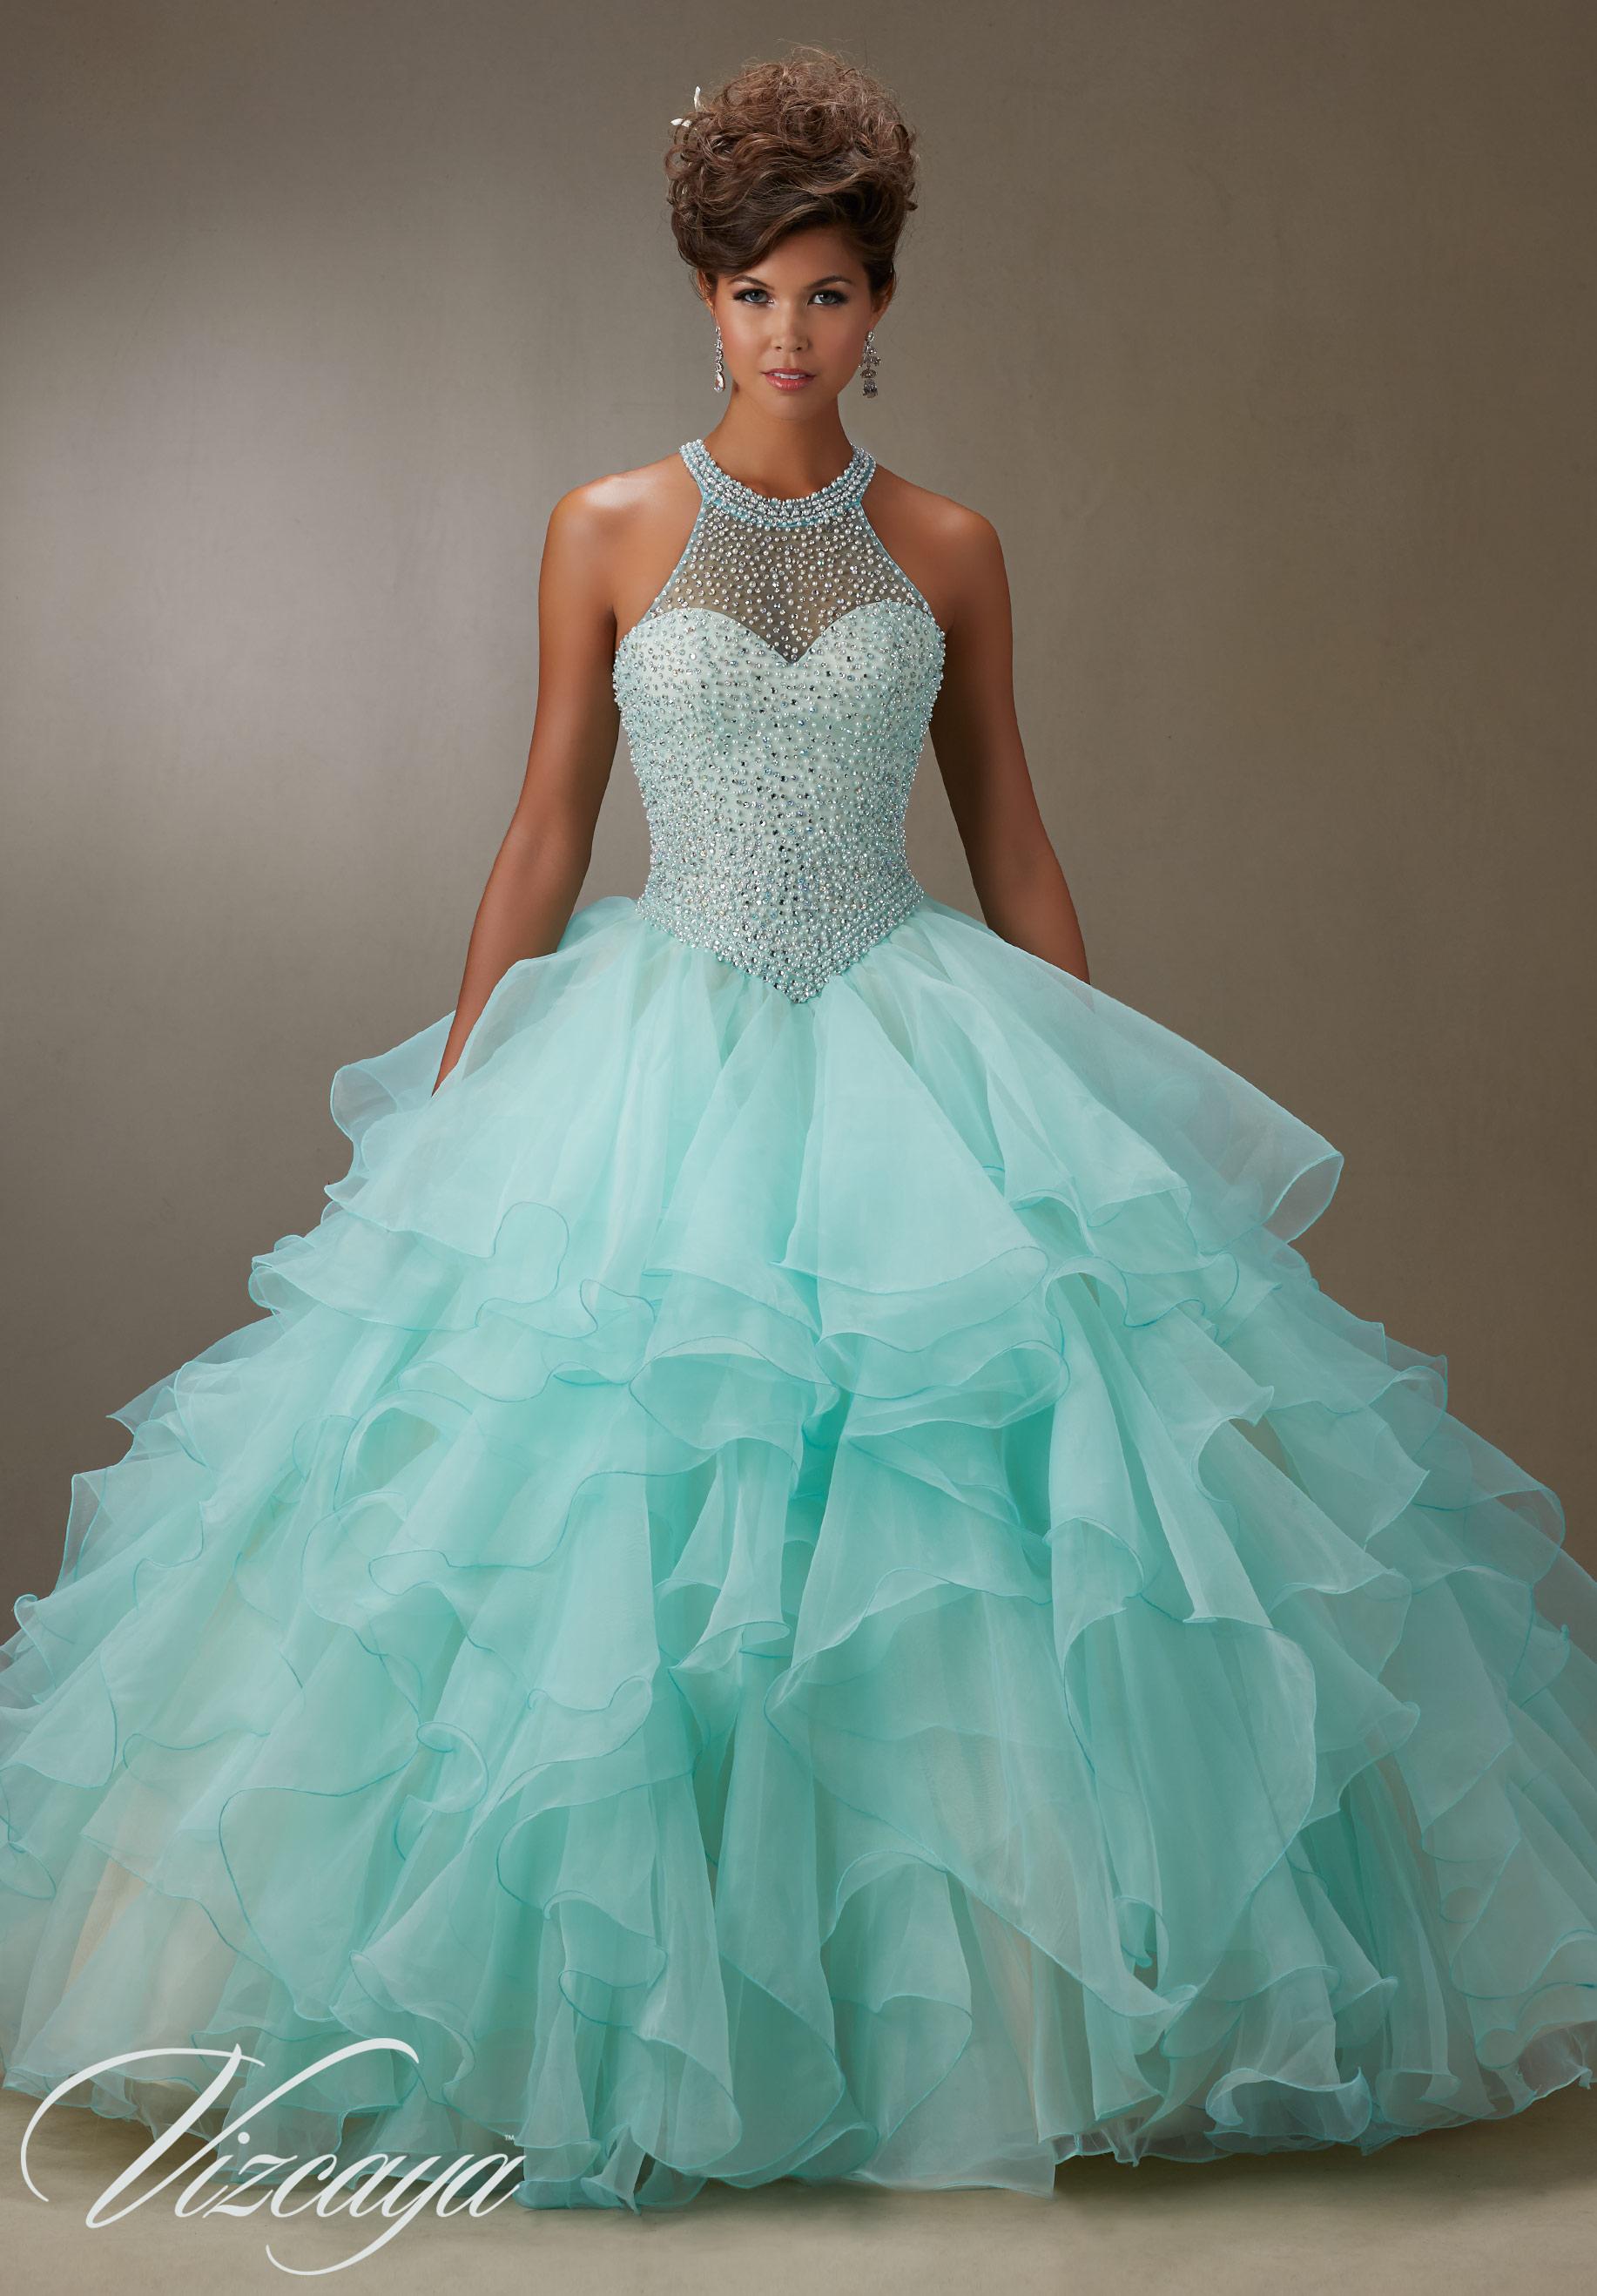 Beautiful Wedding Dress with Mint Green | Wedding